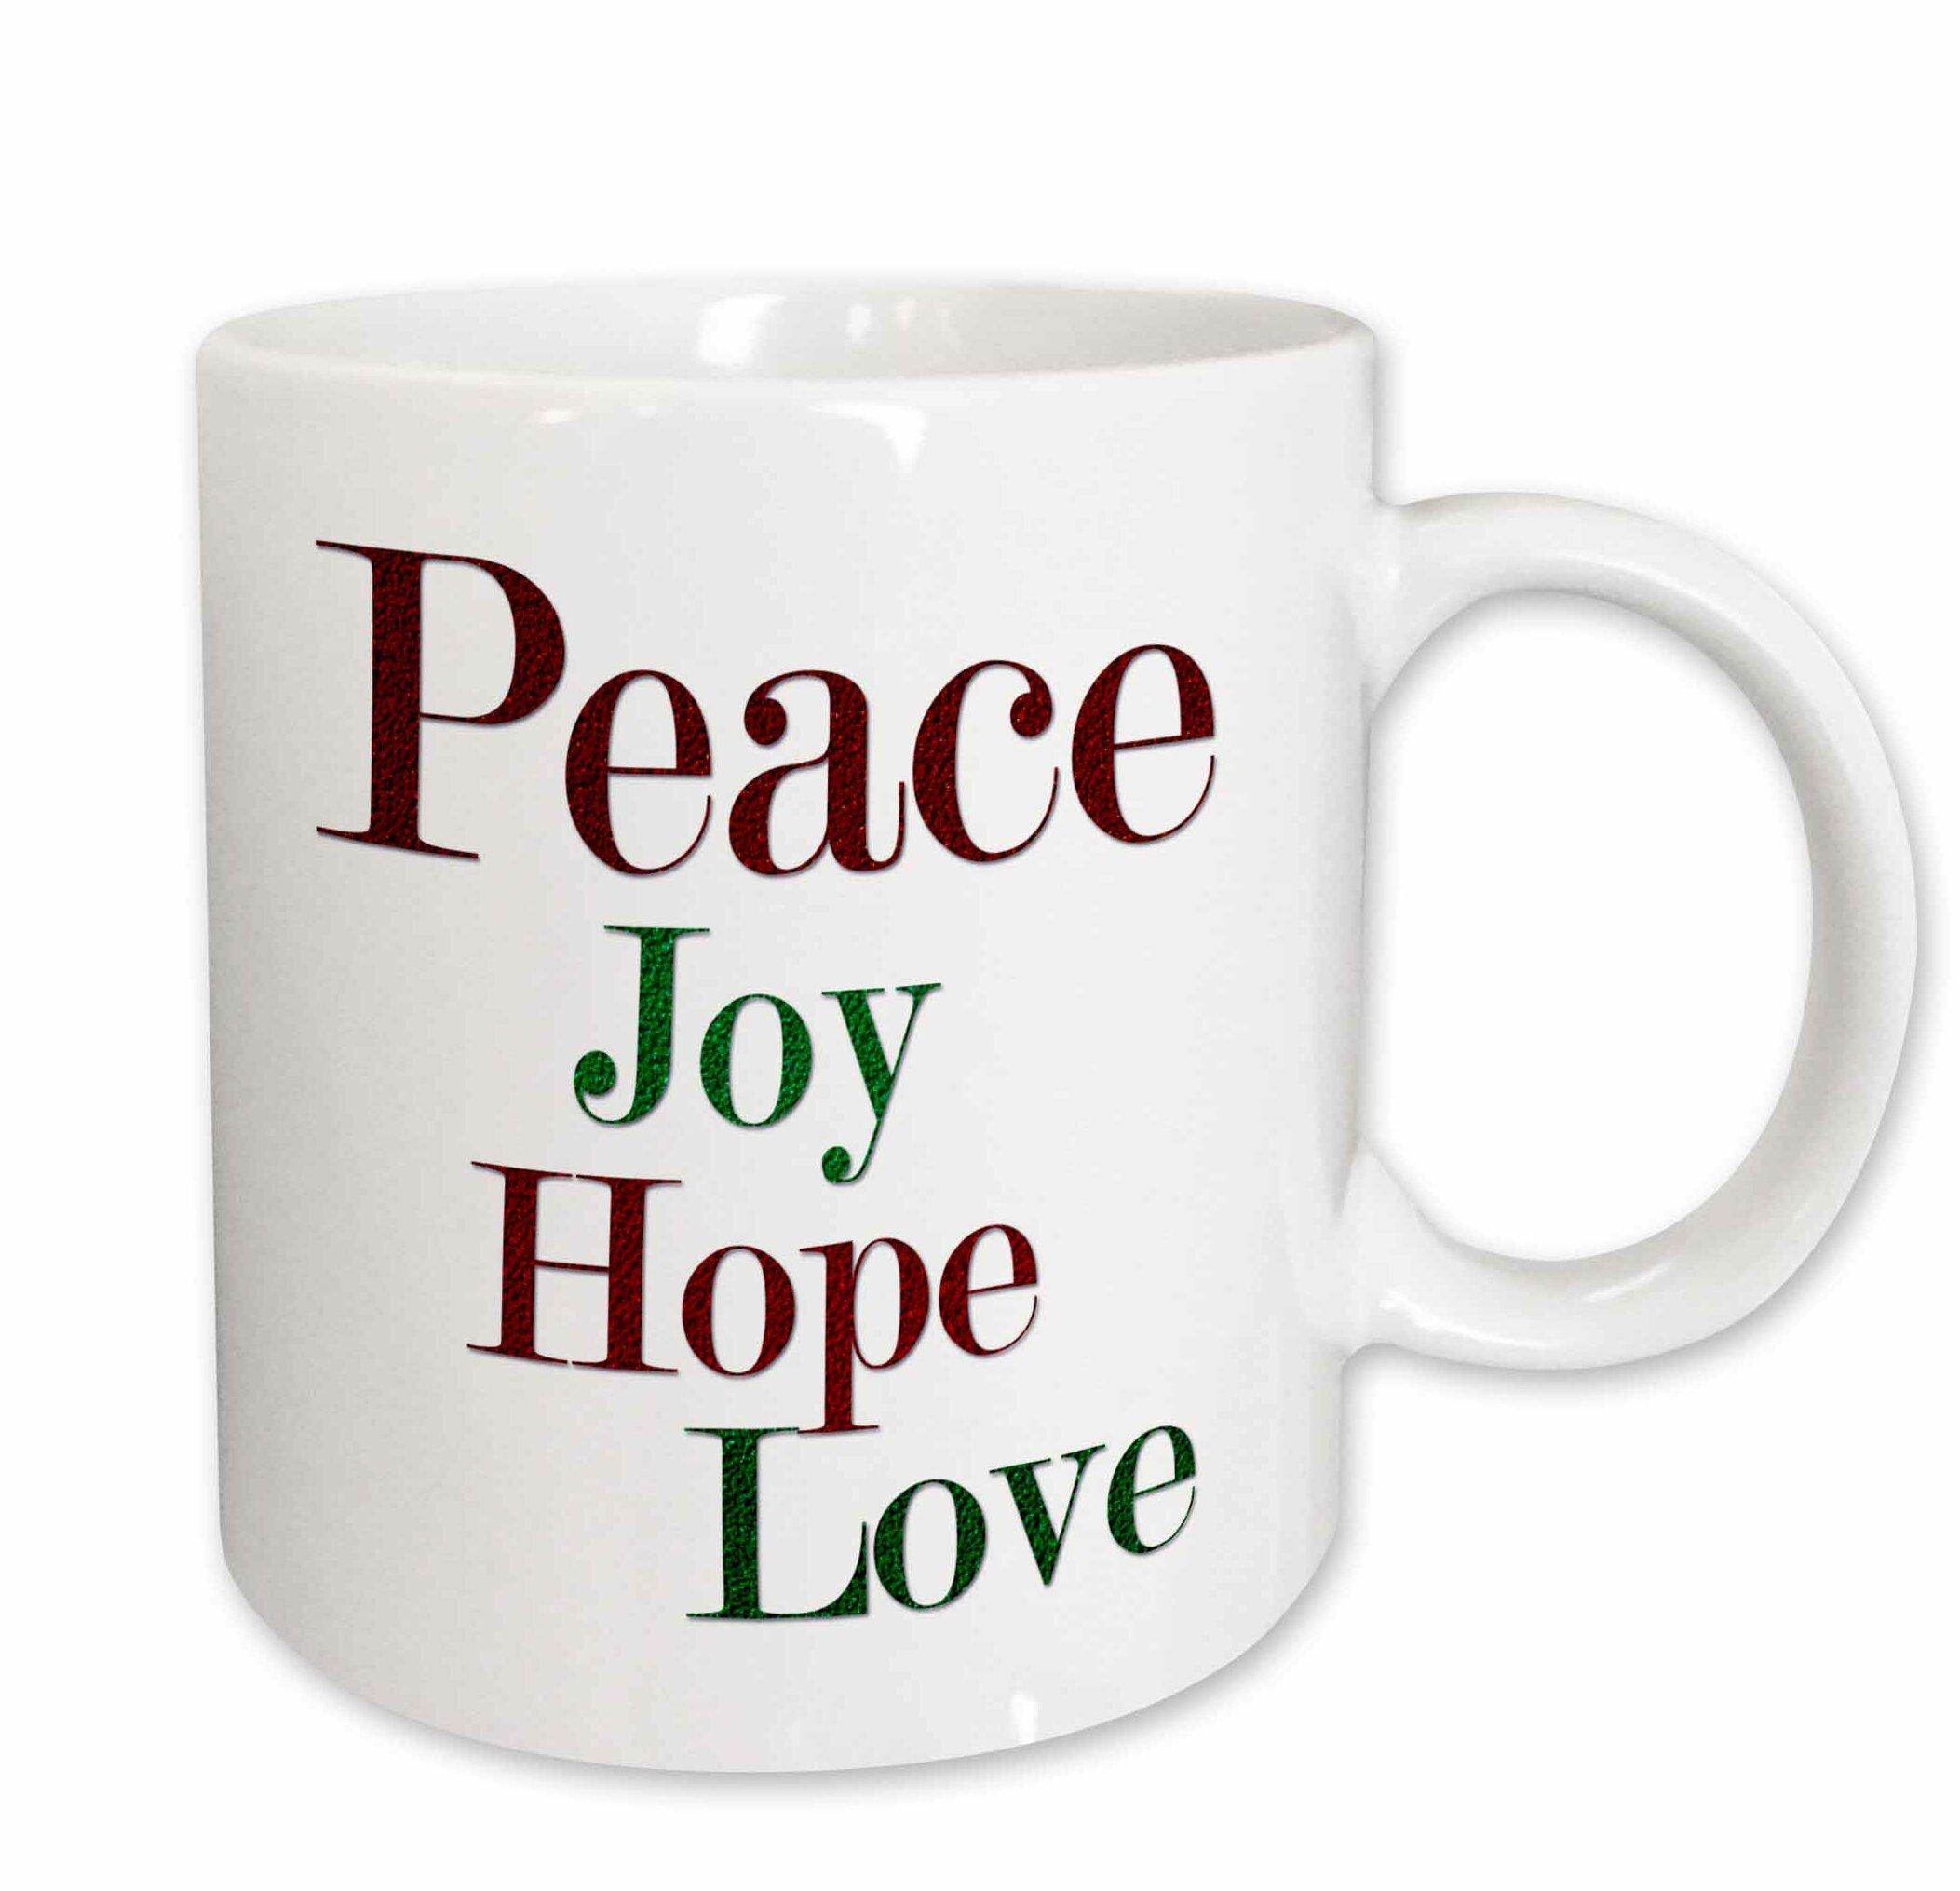 3drose Peace Joy Hope Love Words In And Green Glitter Effect Coffee Mug Wayfair